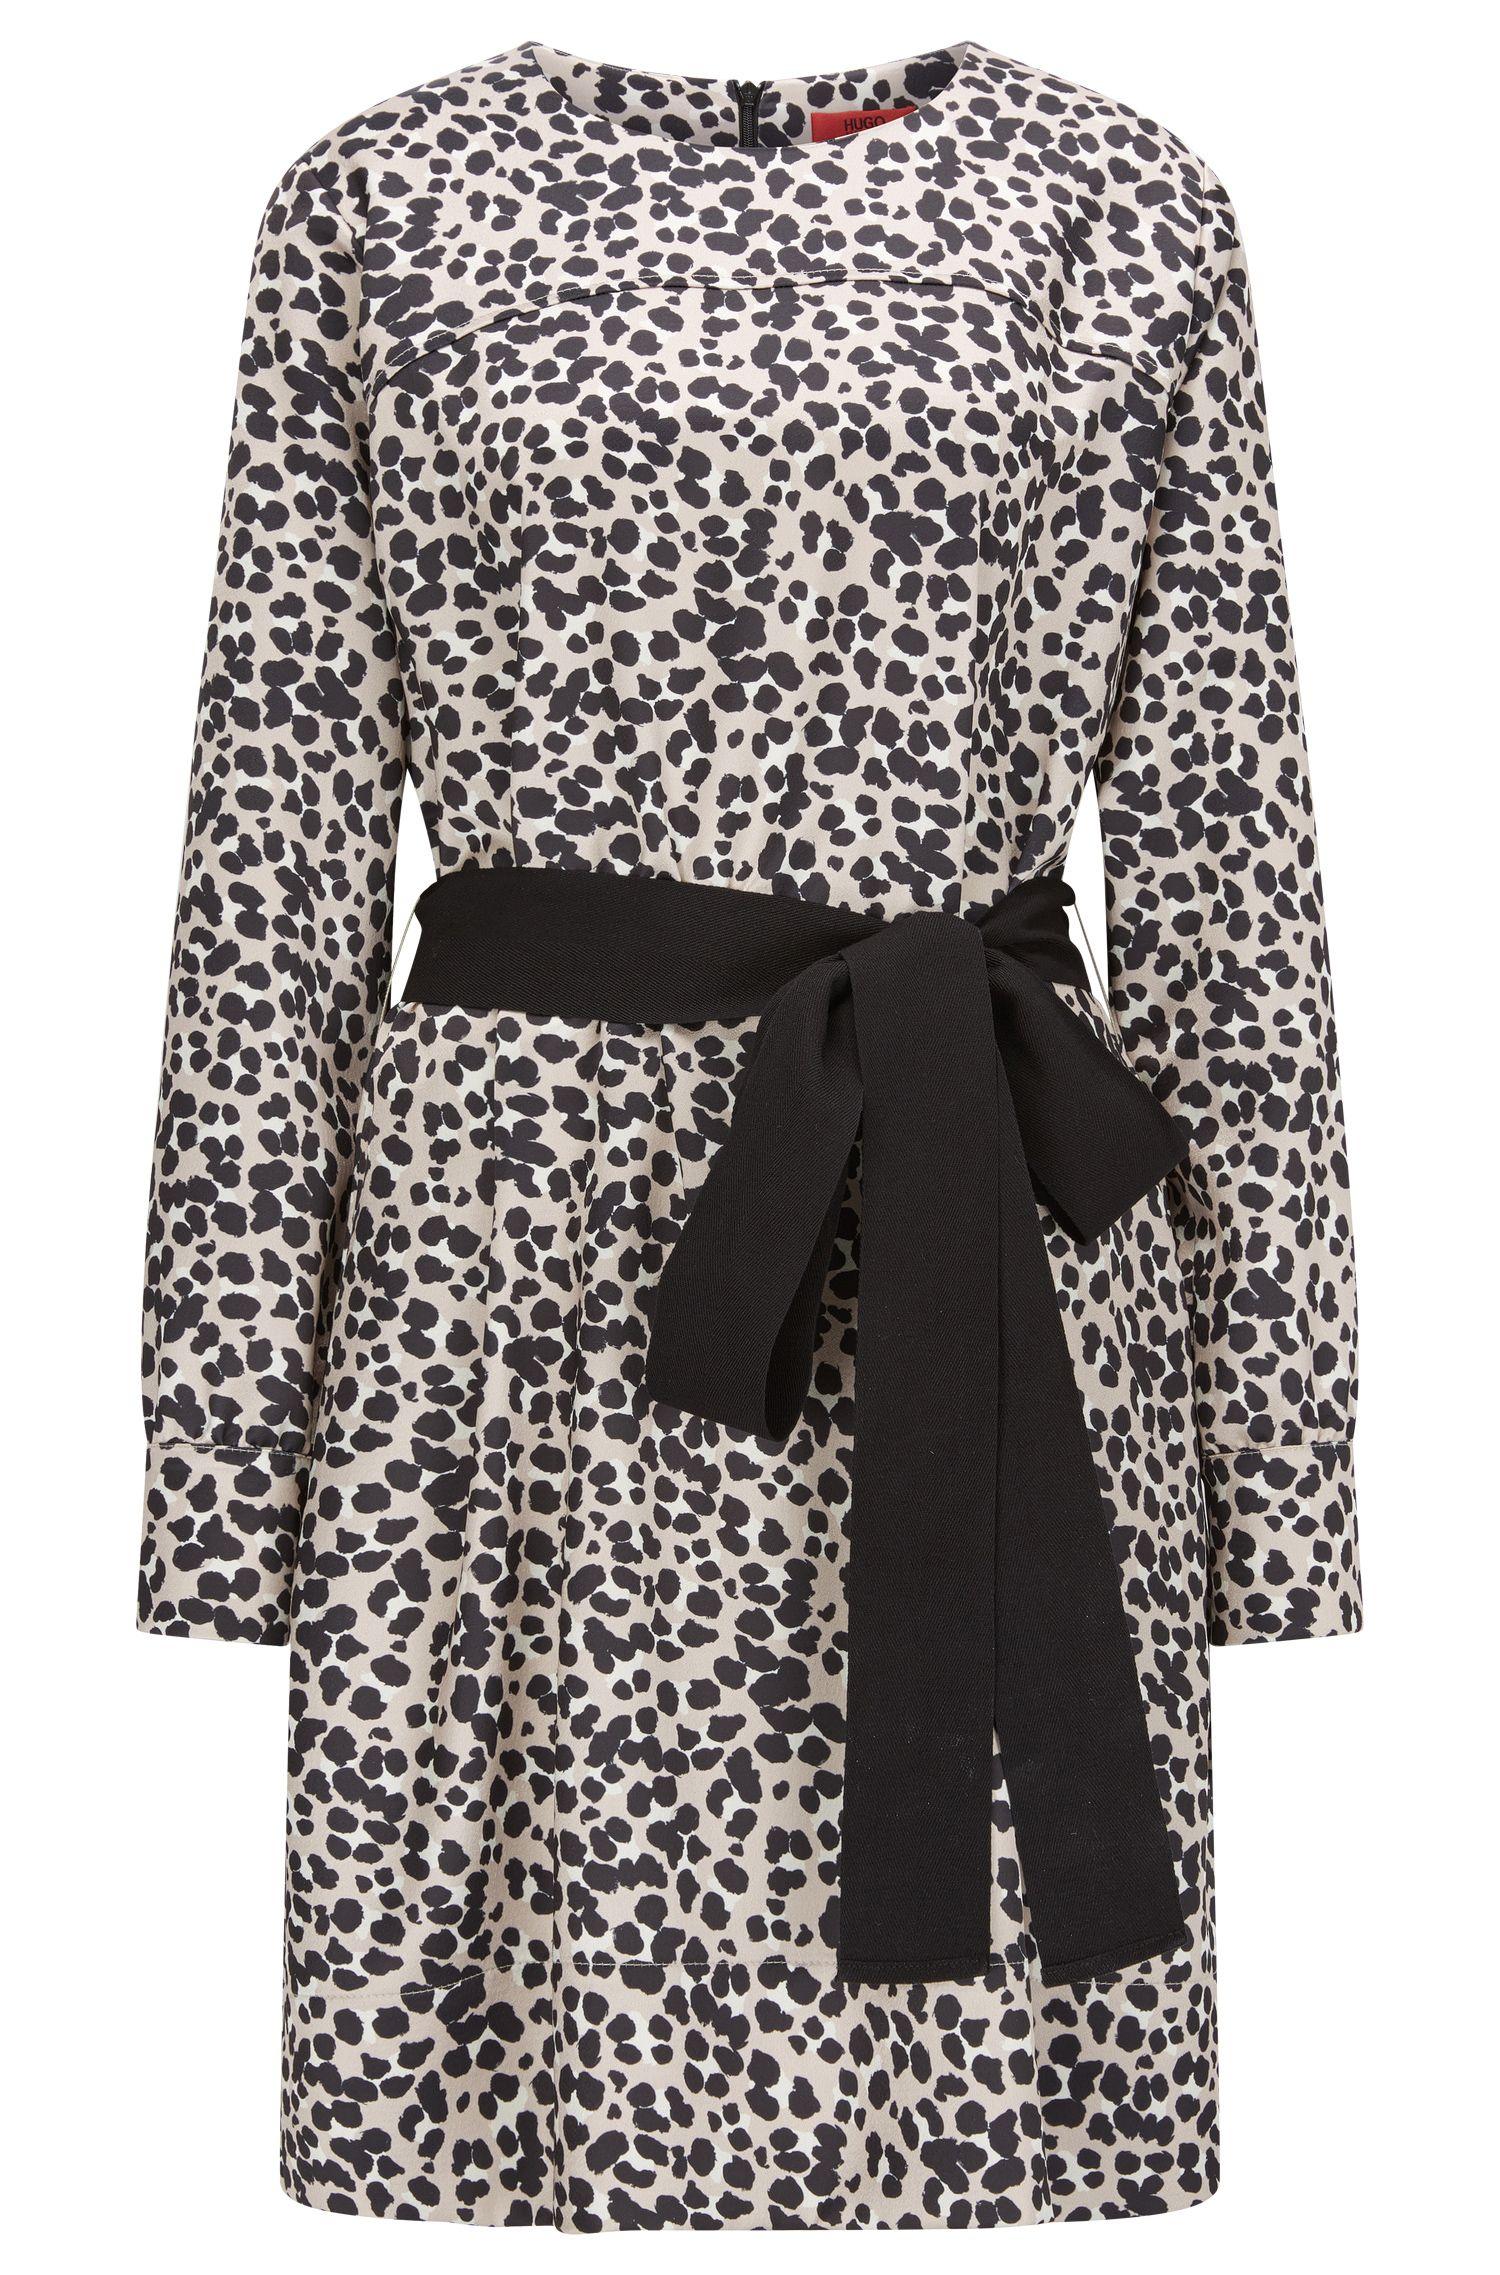 Cheetah-print dress in hammered crêpe